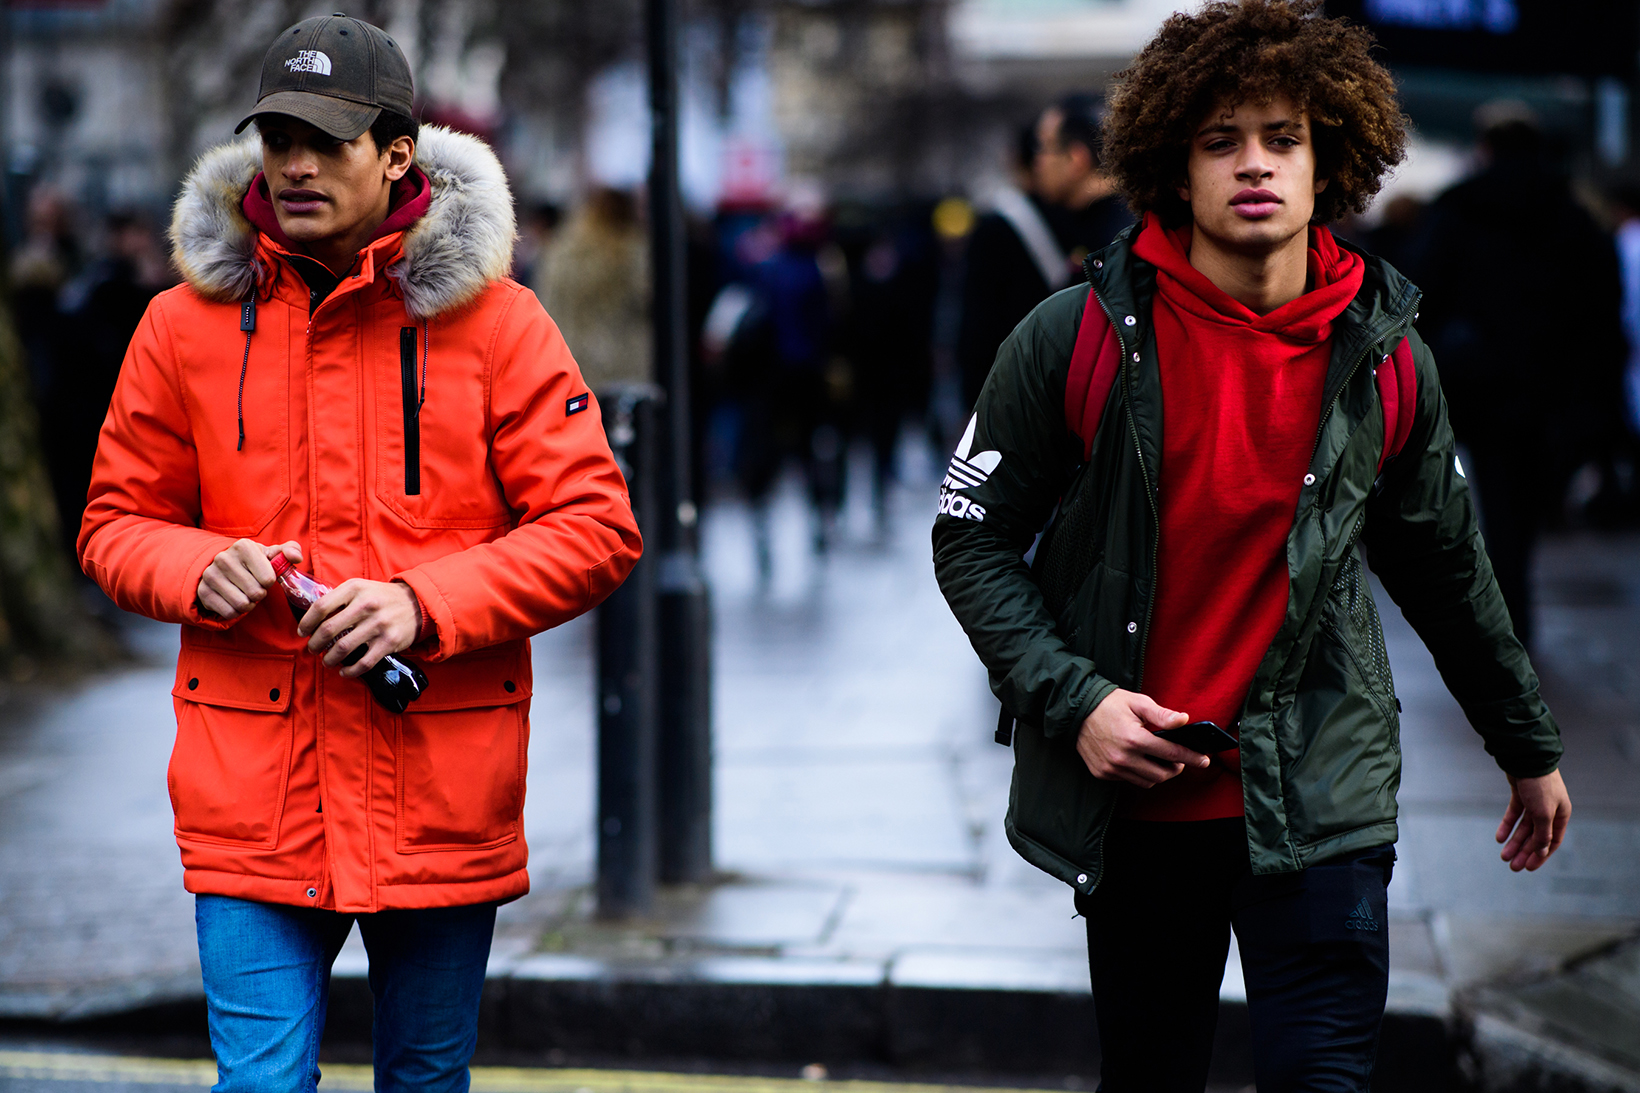 London Fashion Week 2017 Fall Winter Men's Day 4 - 1842493